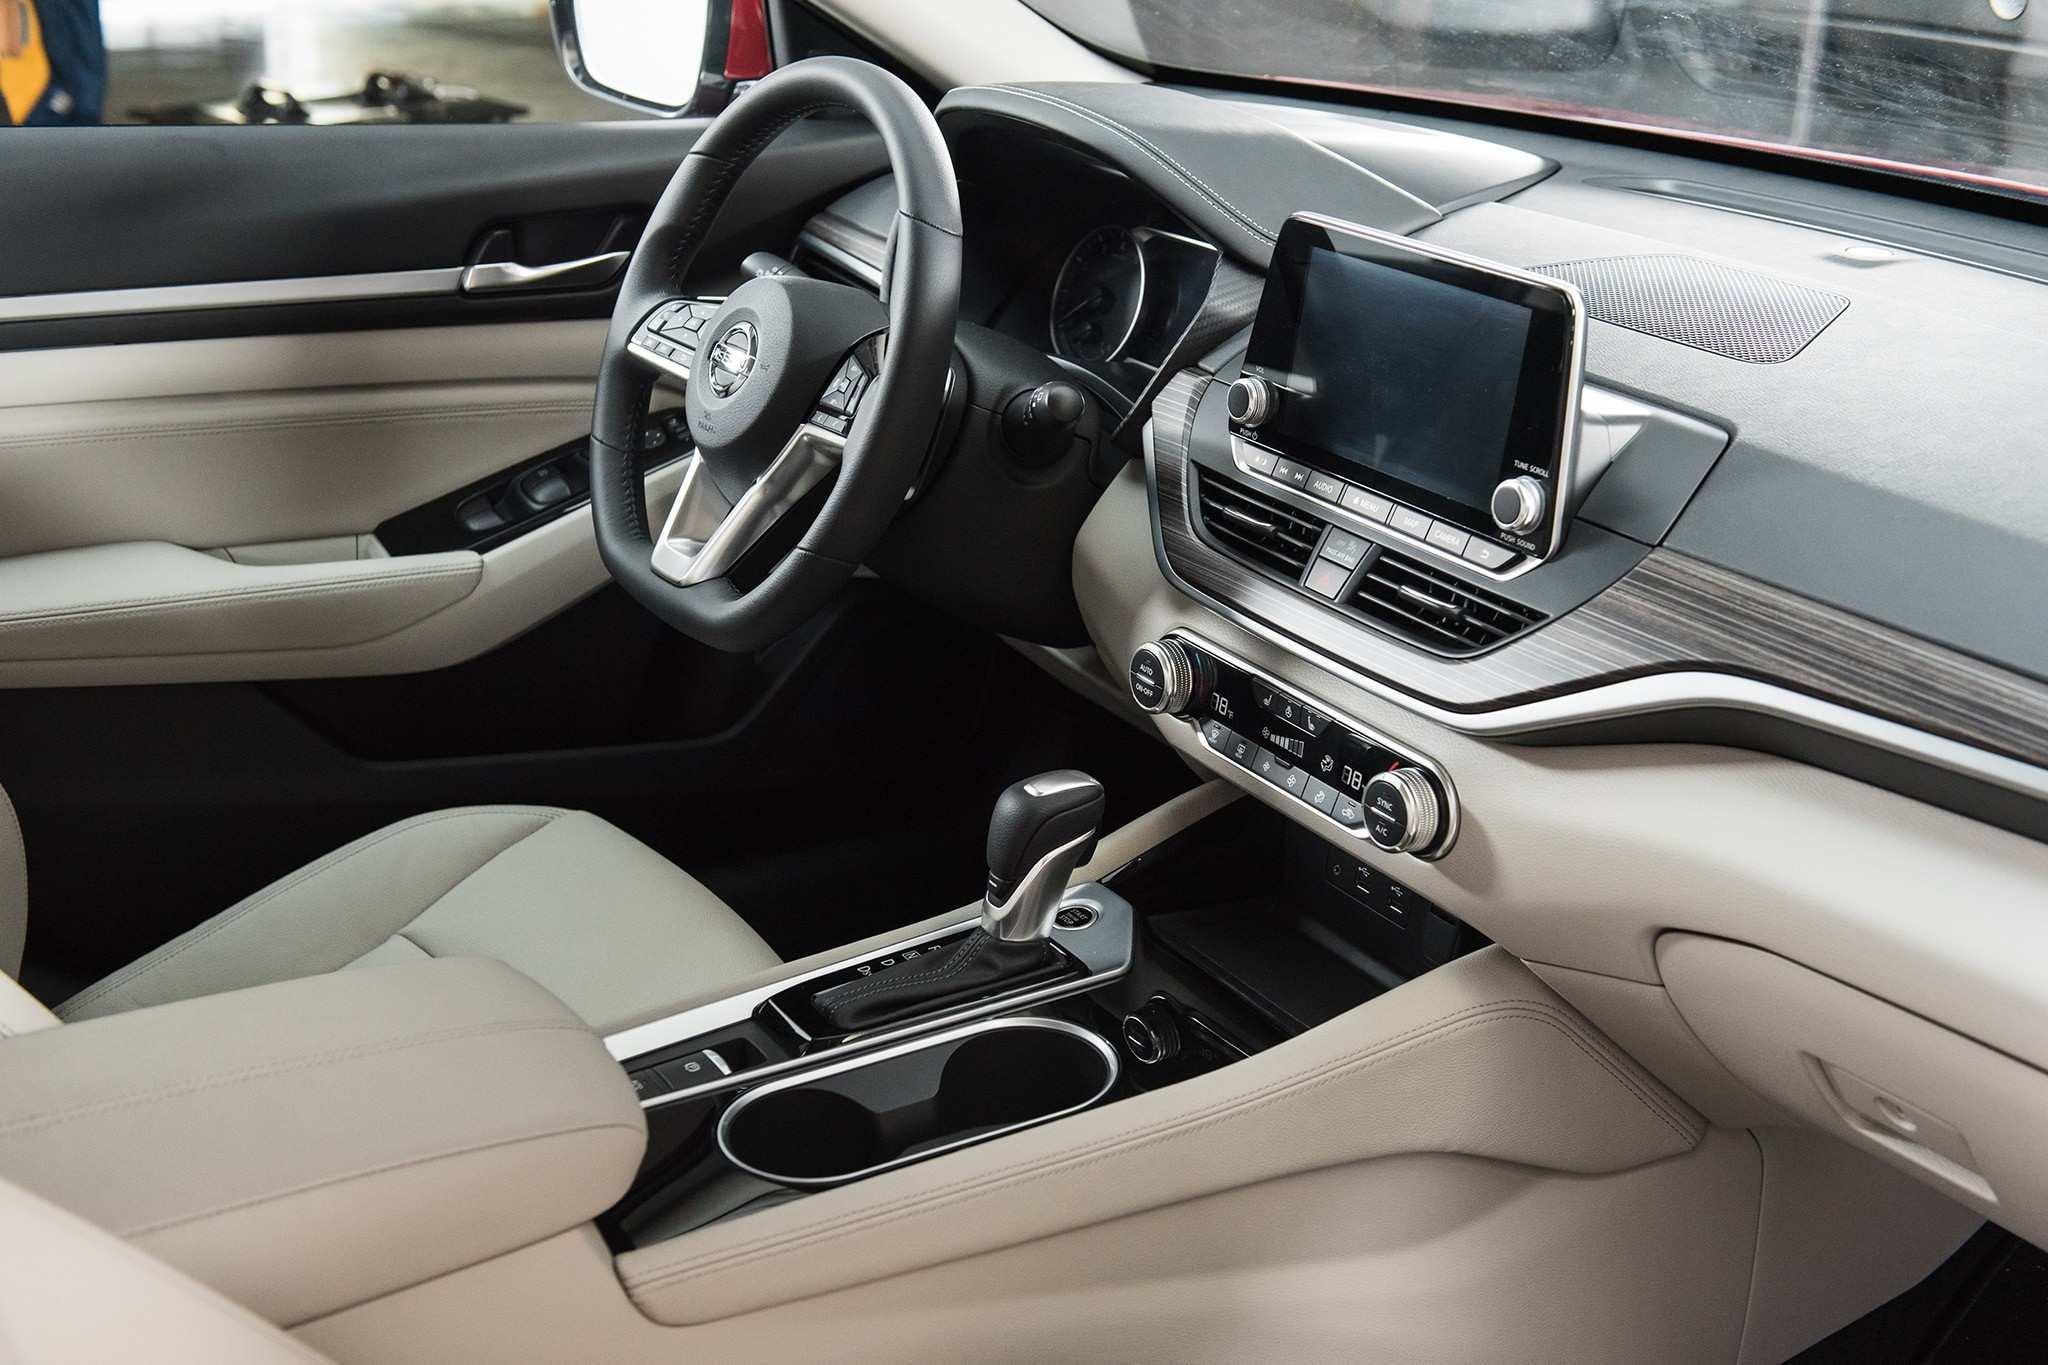 37 New Nissan Bis 2020 Performance by Nissan Bis 2020